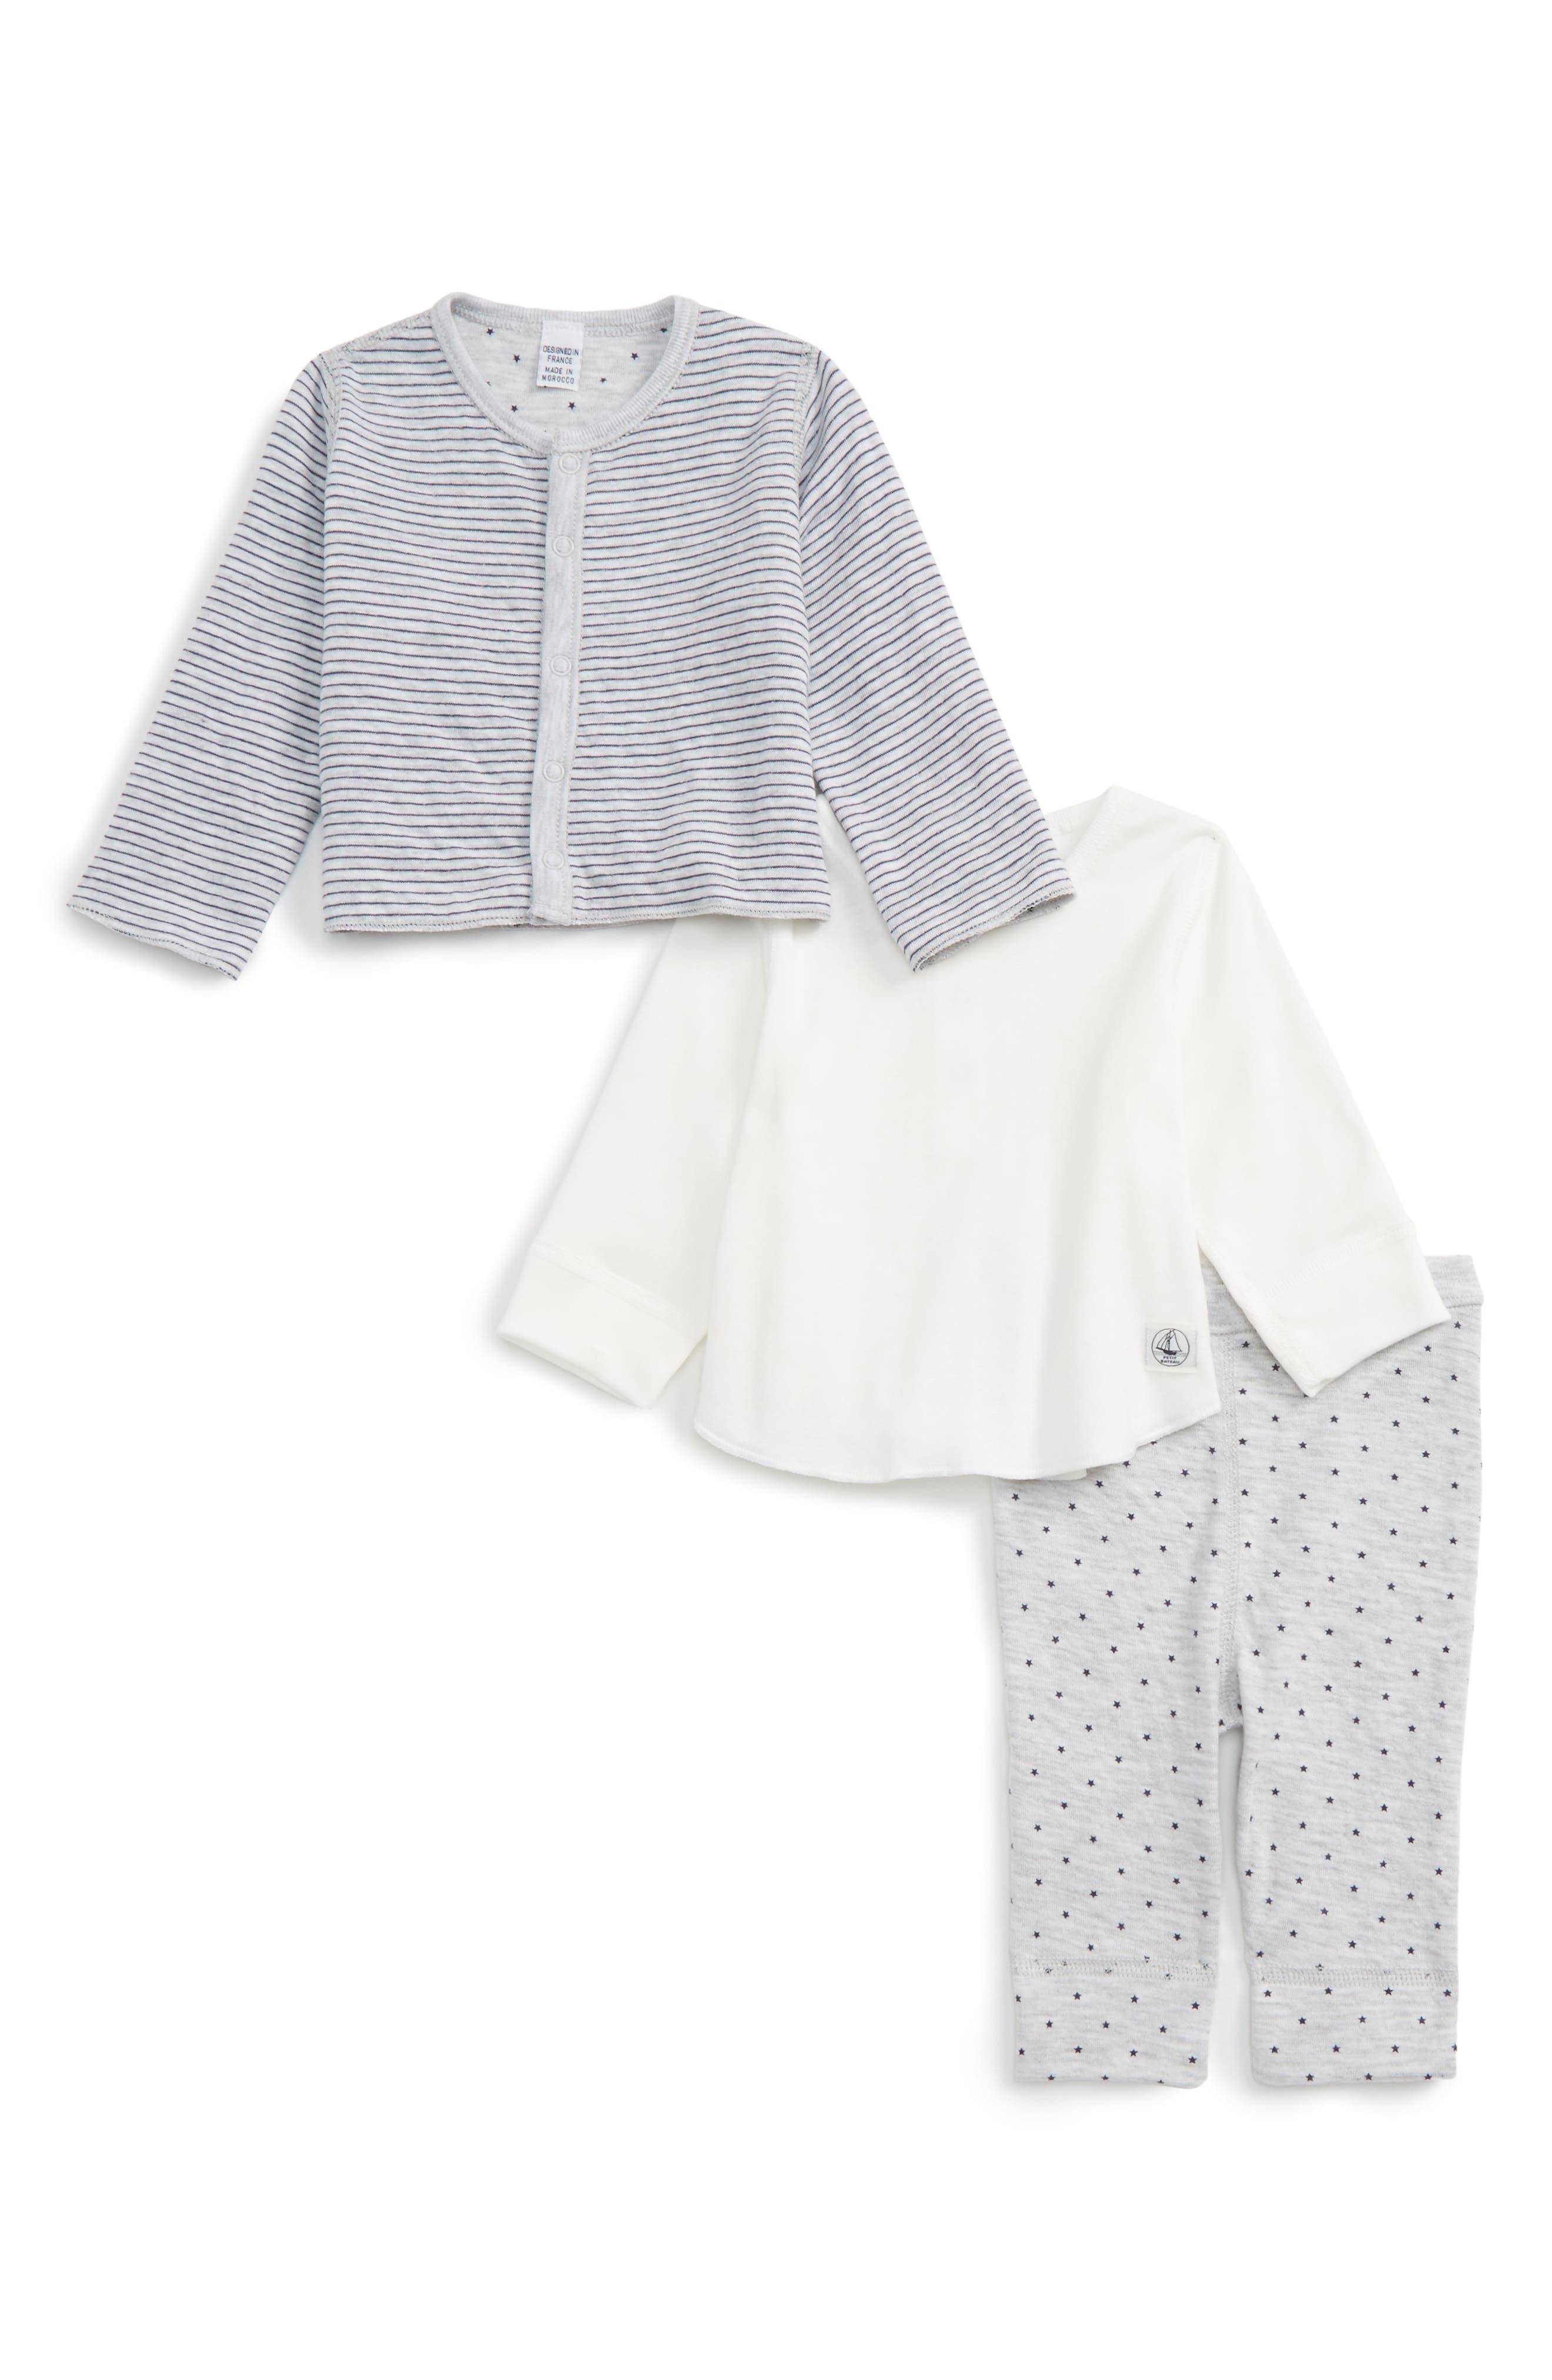 PETIT BATEAU Jacket, Tee & Pants Set